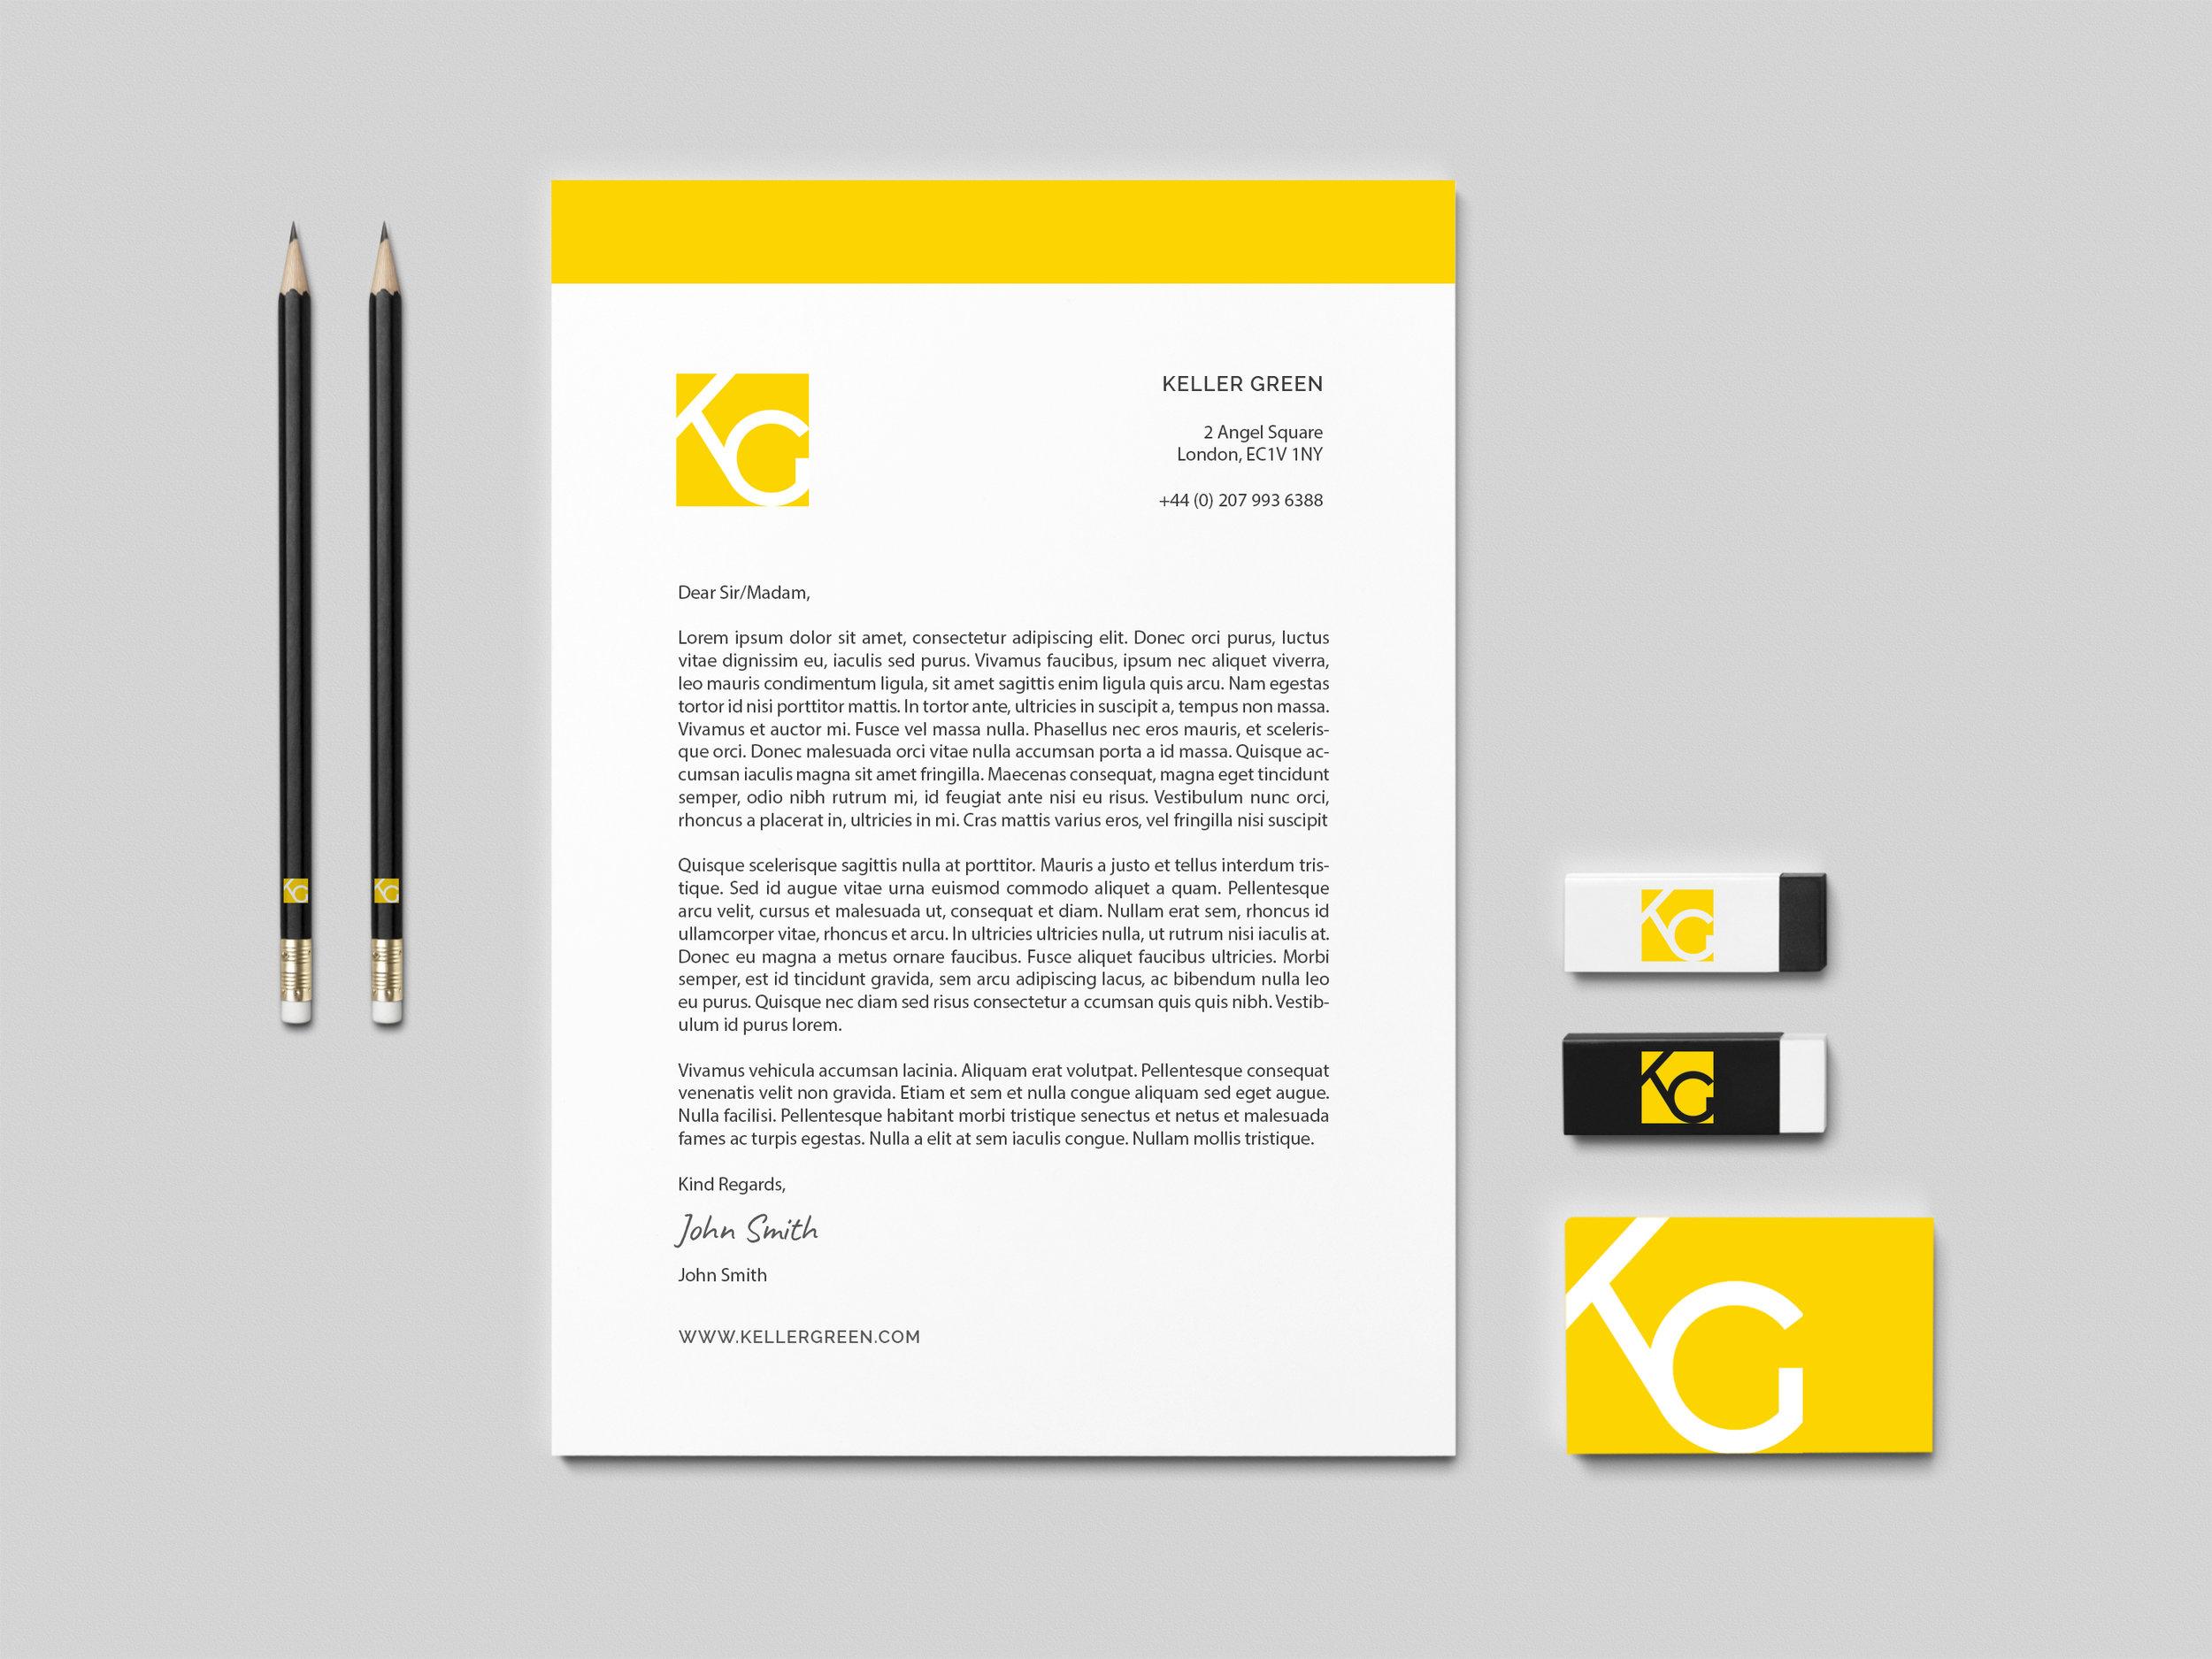 KG_Brand_Mockup.jpg